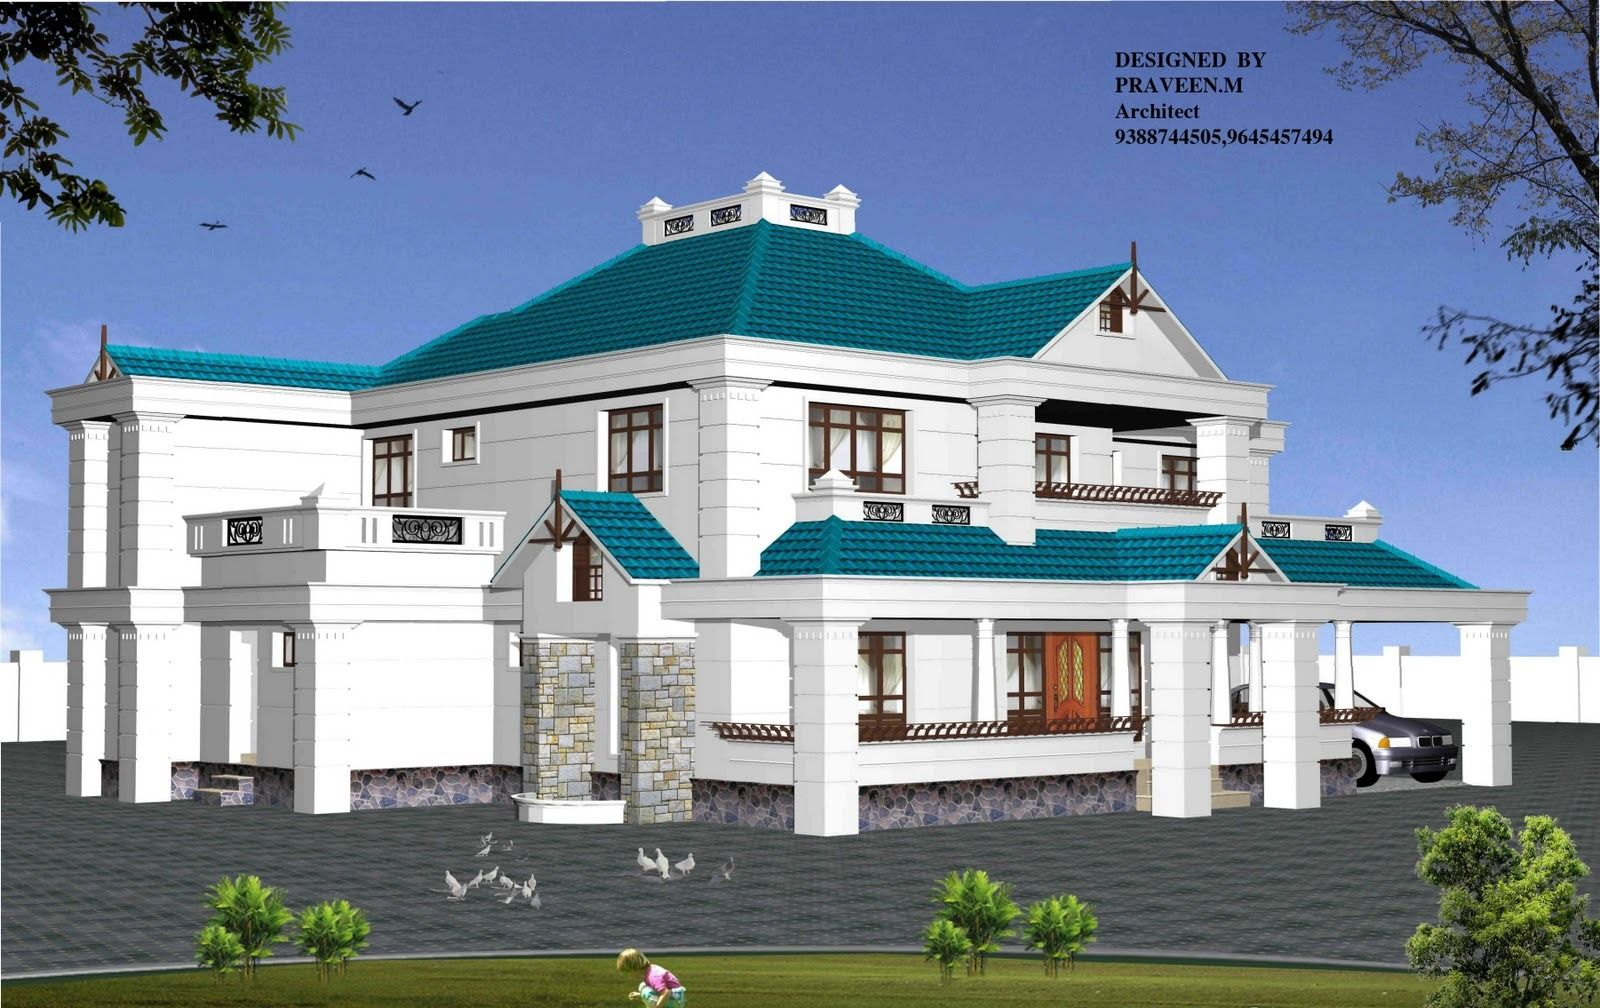 Hausfrontdesign in rajasthan top d architecture modeling  d architecture and architecture